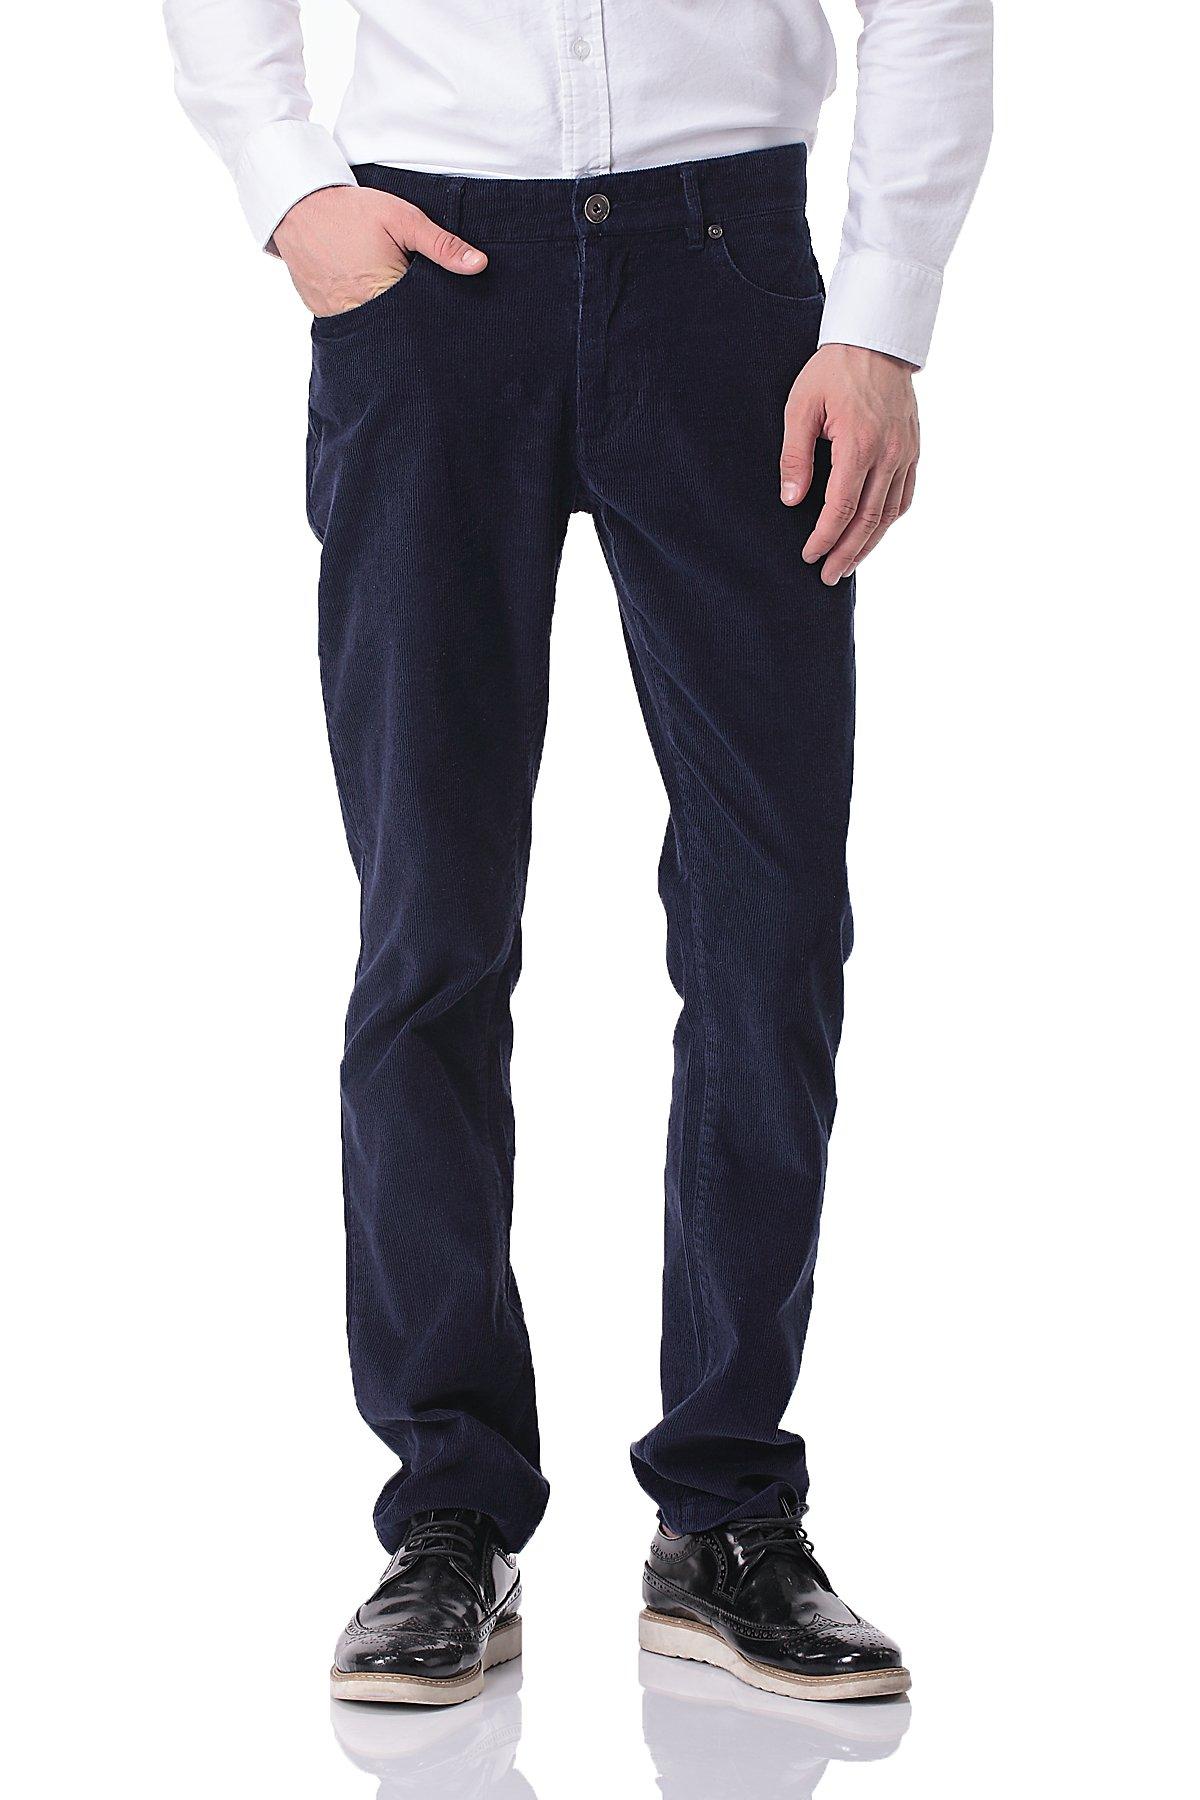 Pau1Hami1ton PH-06 Men's Corduroy Pants Straight Leg Slim Fit Casual Trousers(34,Blue)